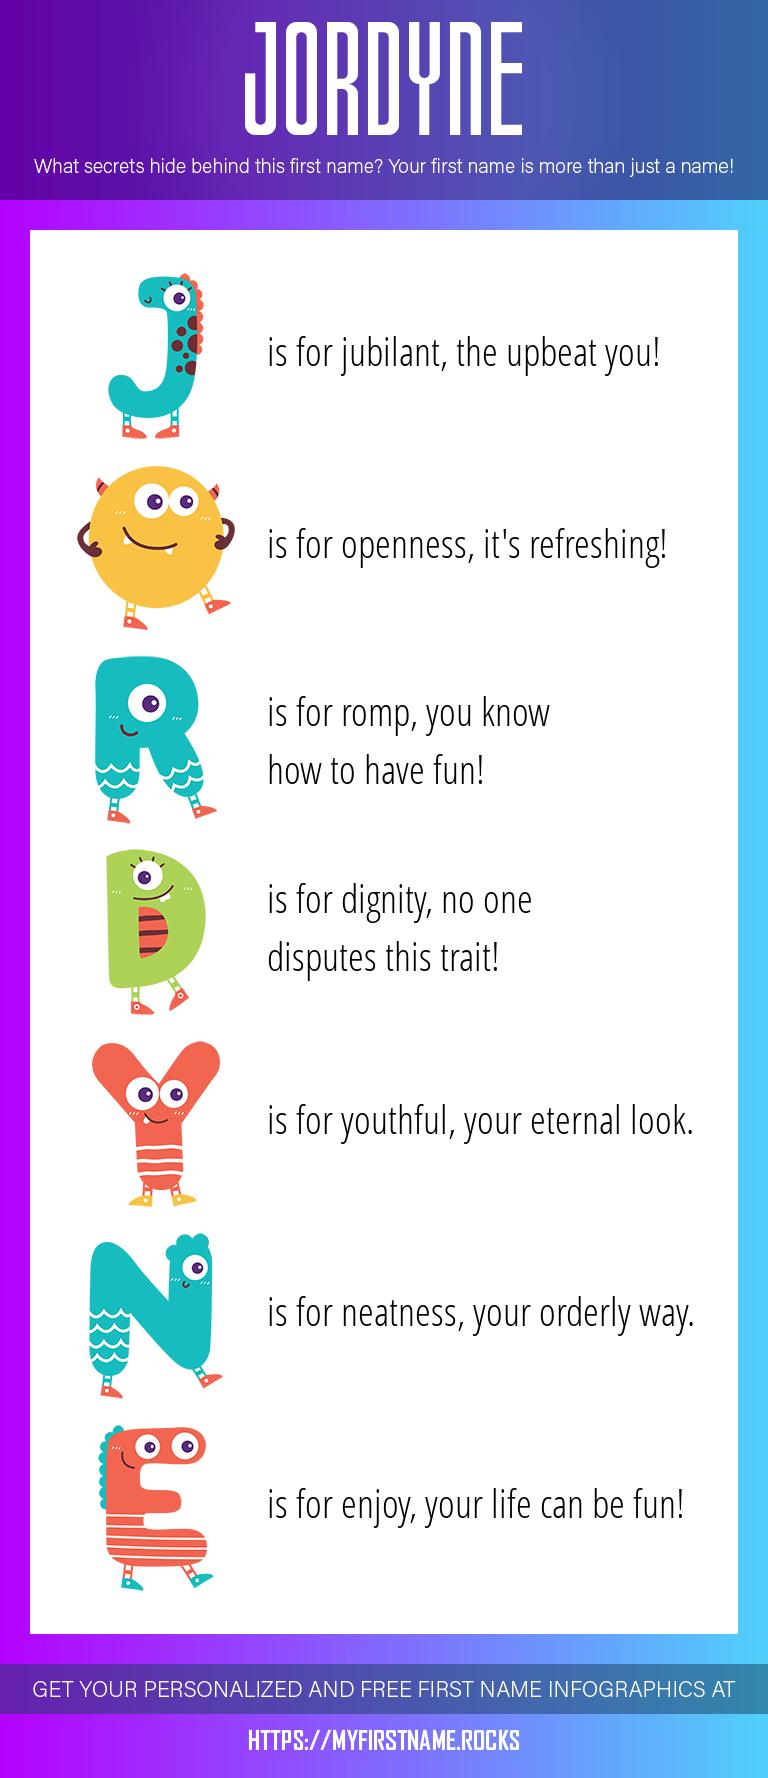 Jordyne Infographics